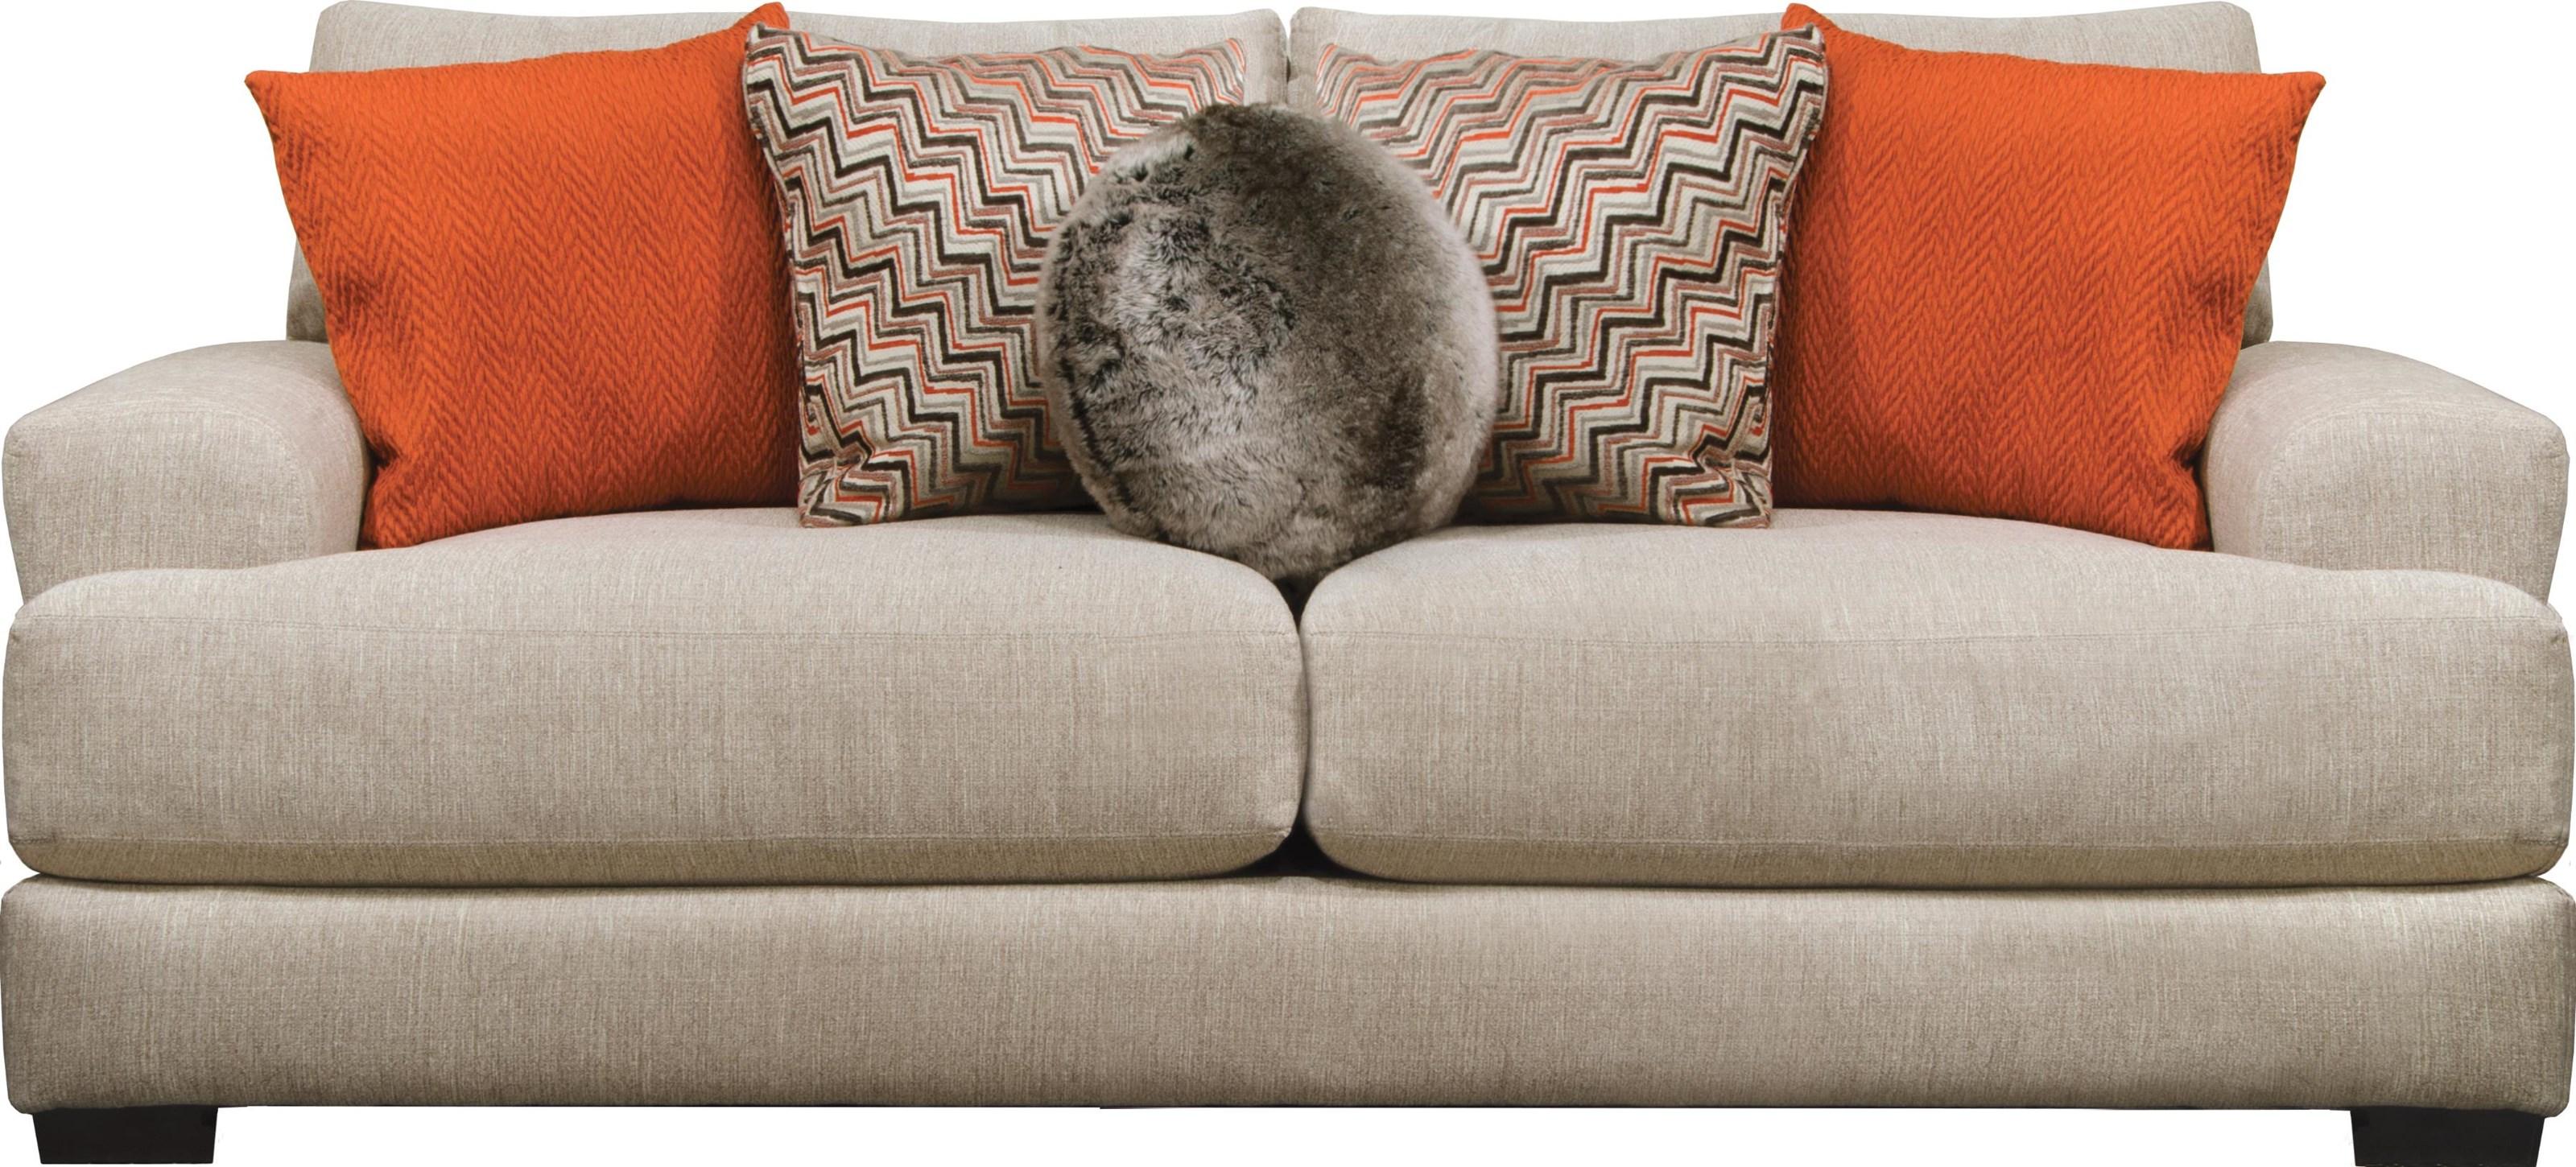 Merveilleux Jackson Furniture Ava CashewSofa ...